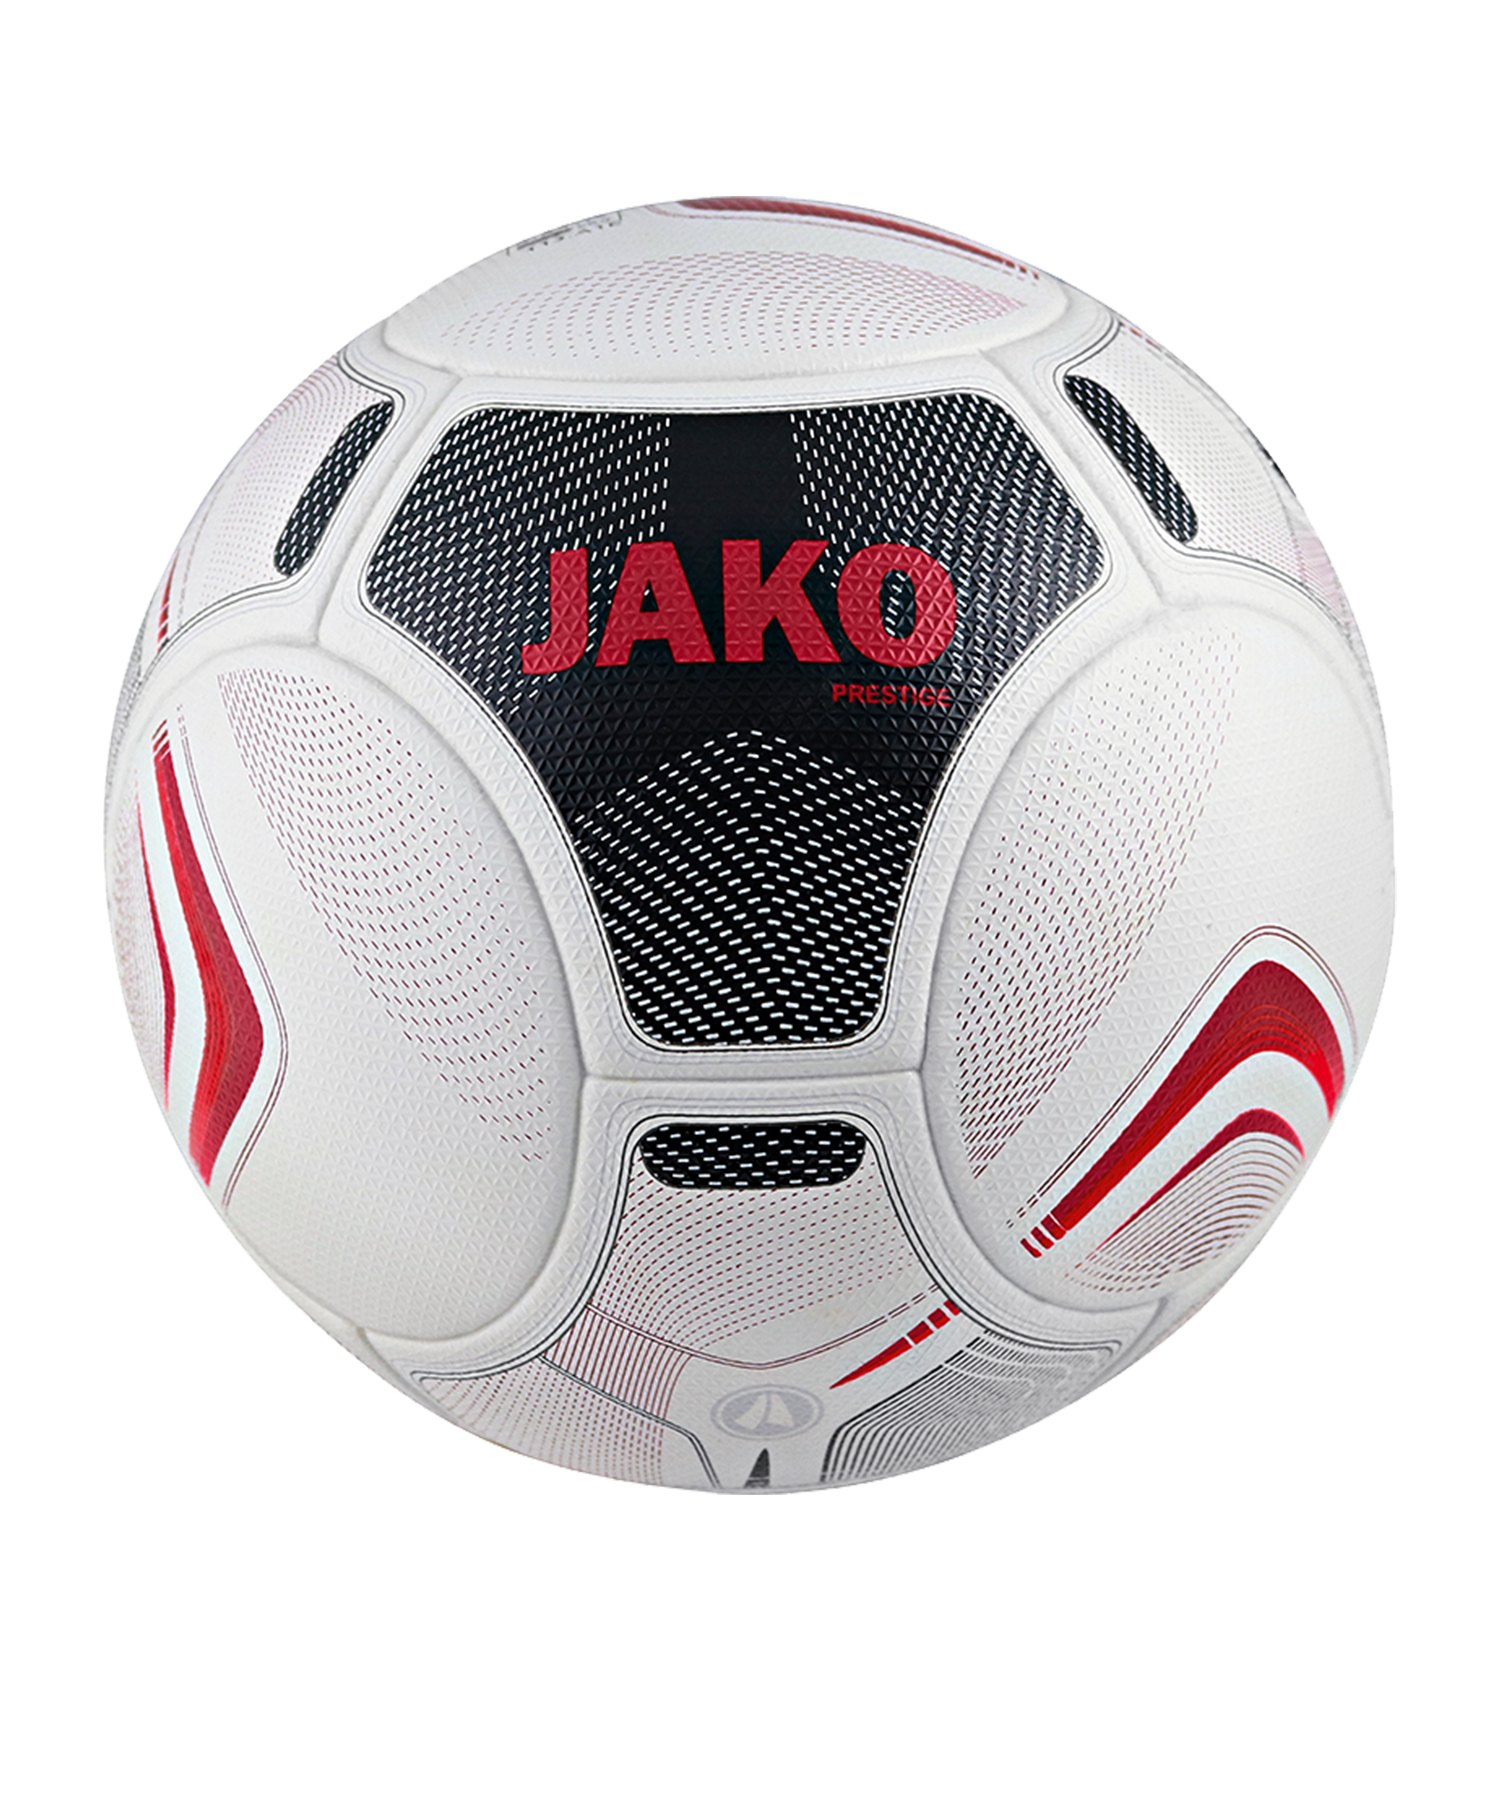 Jako Prestige Spielball Weiss Schwarz Rot F00 - Weiss